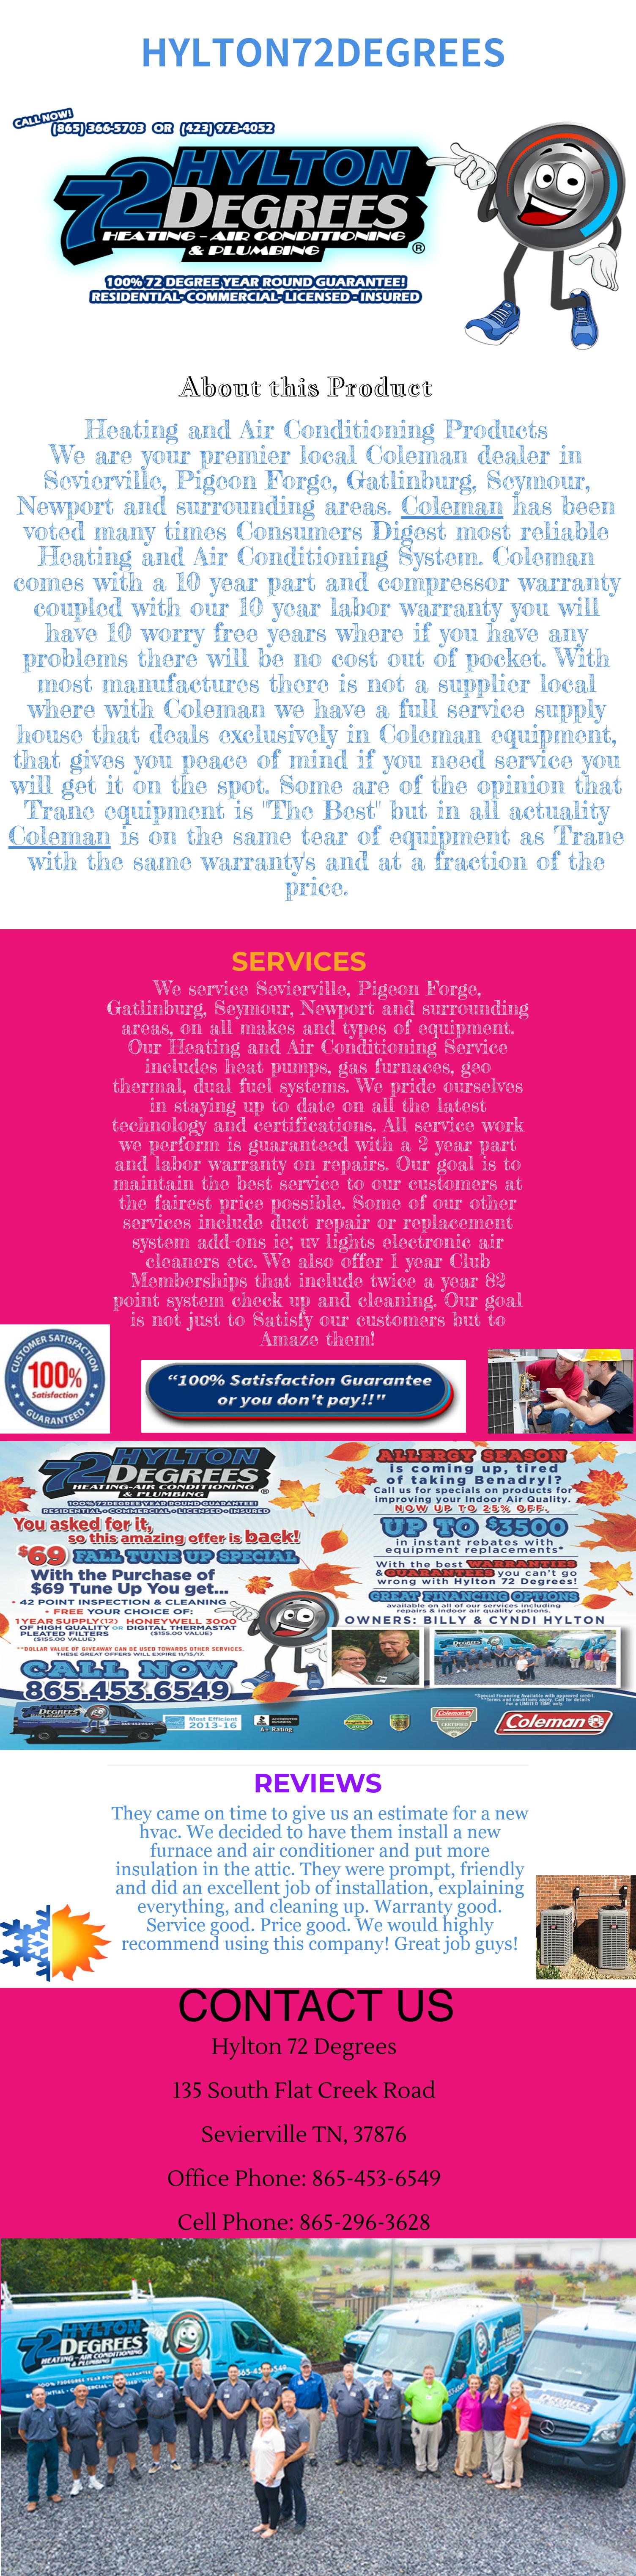 We service Sevierville, Pigeon Gatlinburg, and